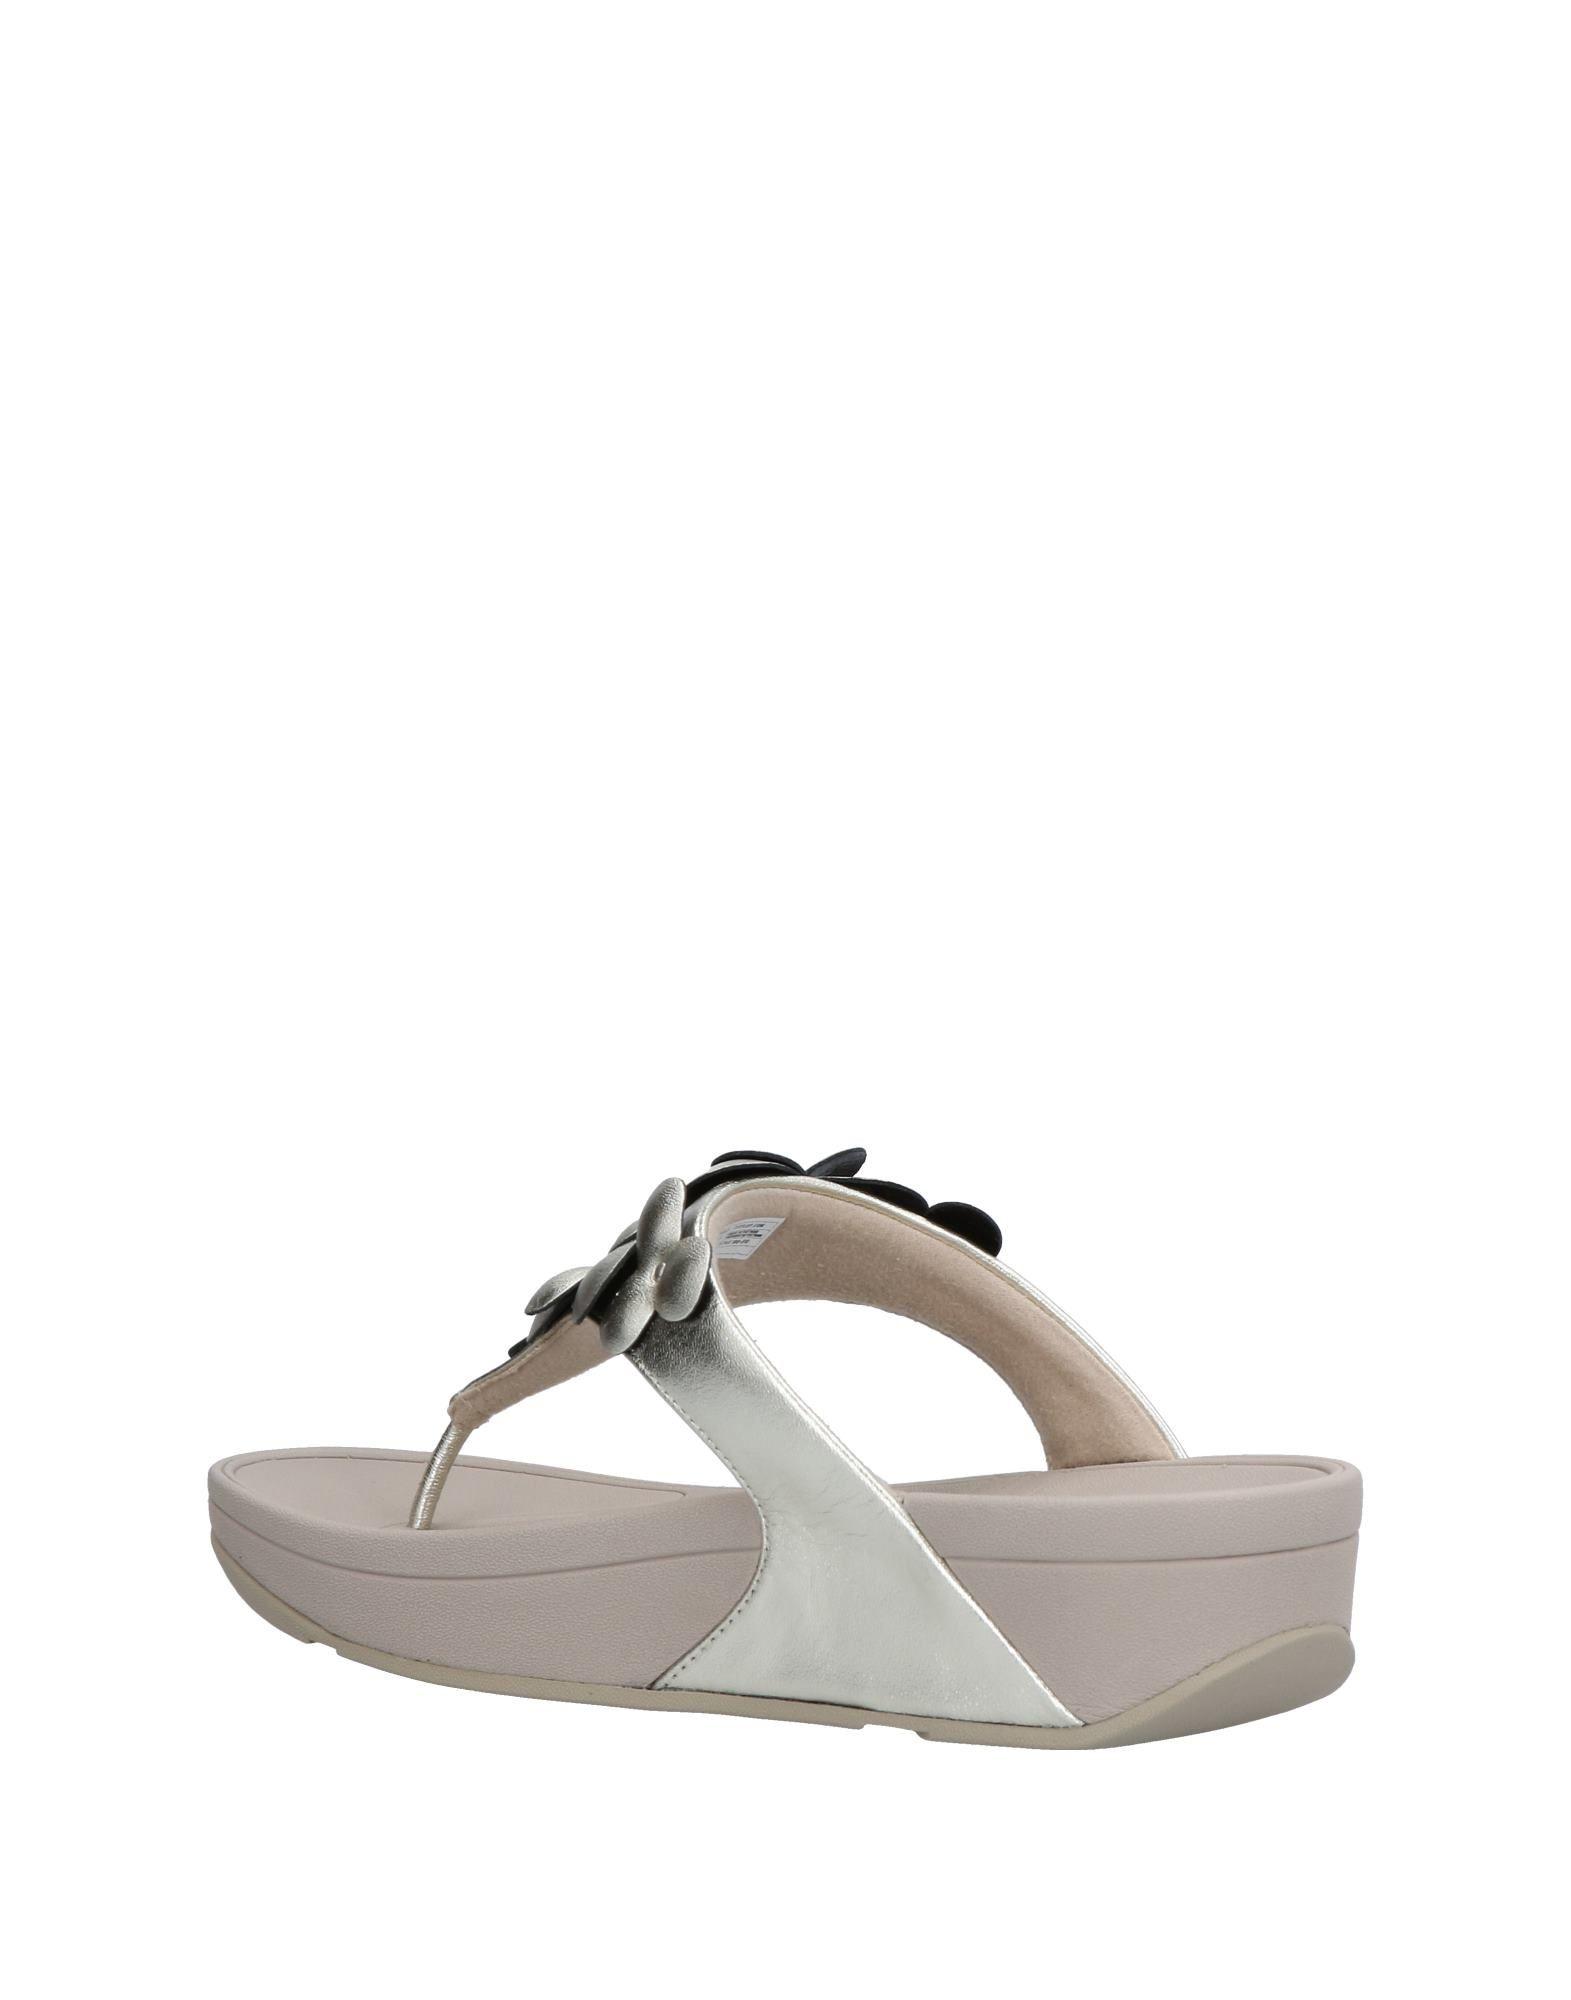 Fitflop Dianetten Damen  beliebte 11503211PF Gute Qualität beliebte  Schuhe 37bc89